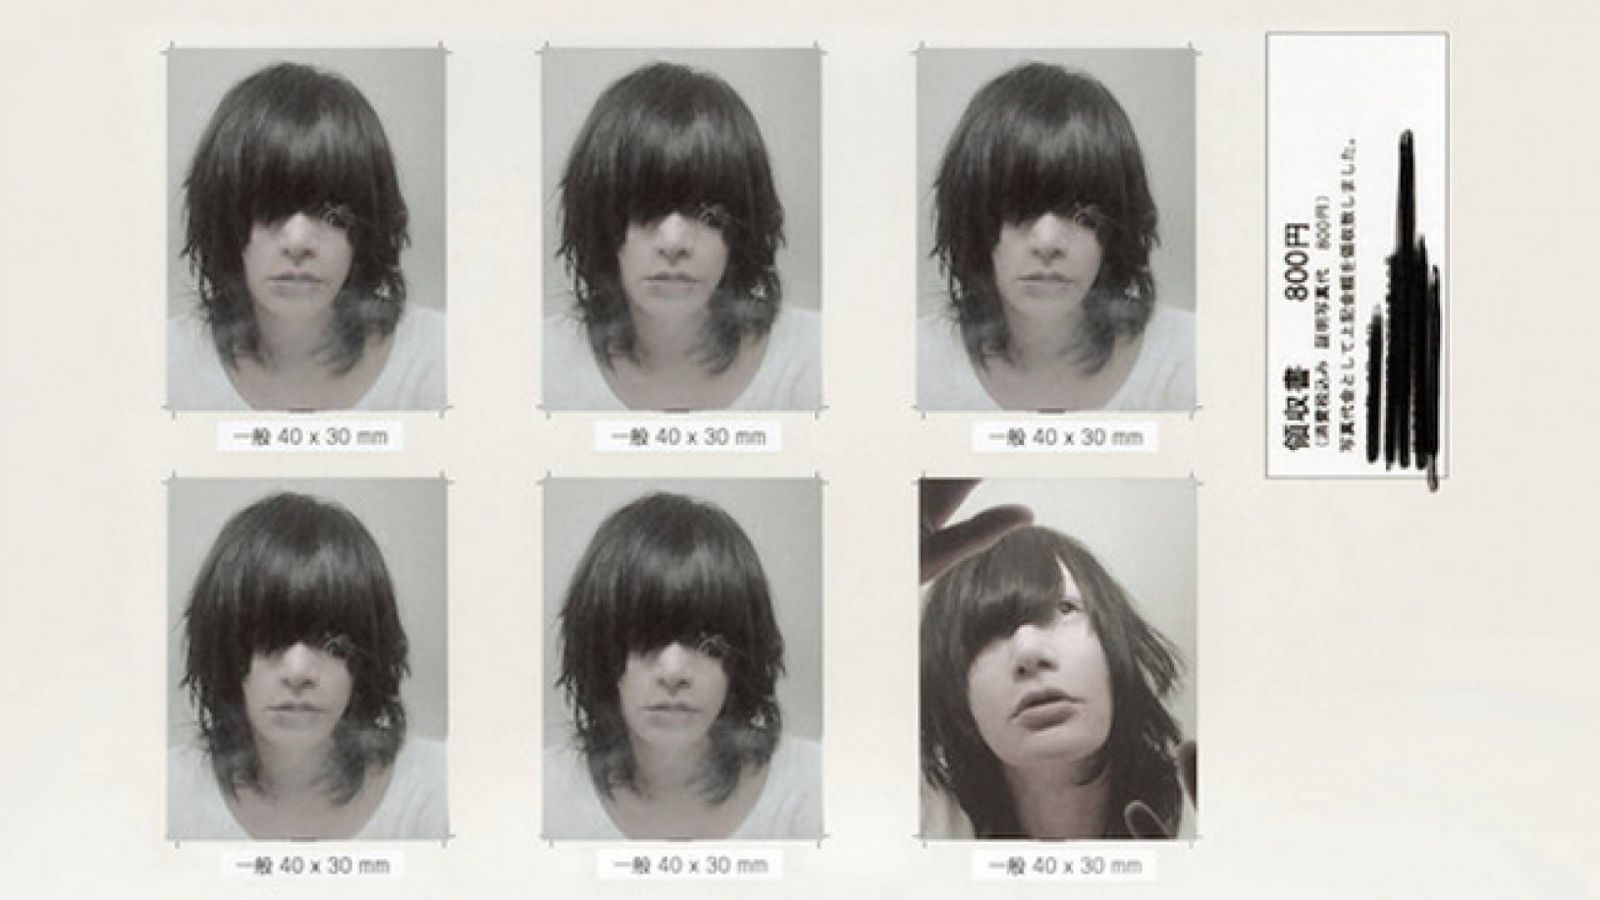 Arimura Ryutaro выпустит сольный альбом © ARINOSu. All rights reserved.